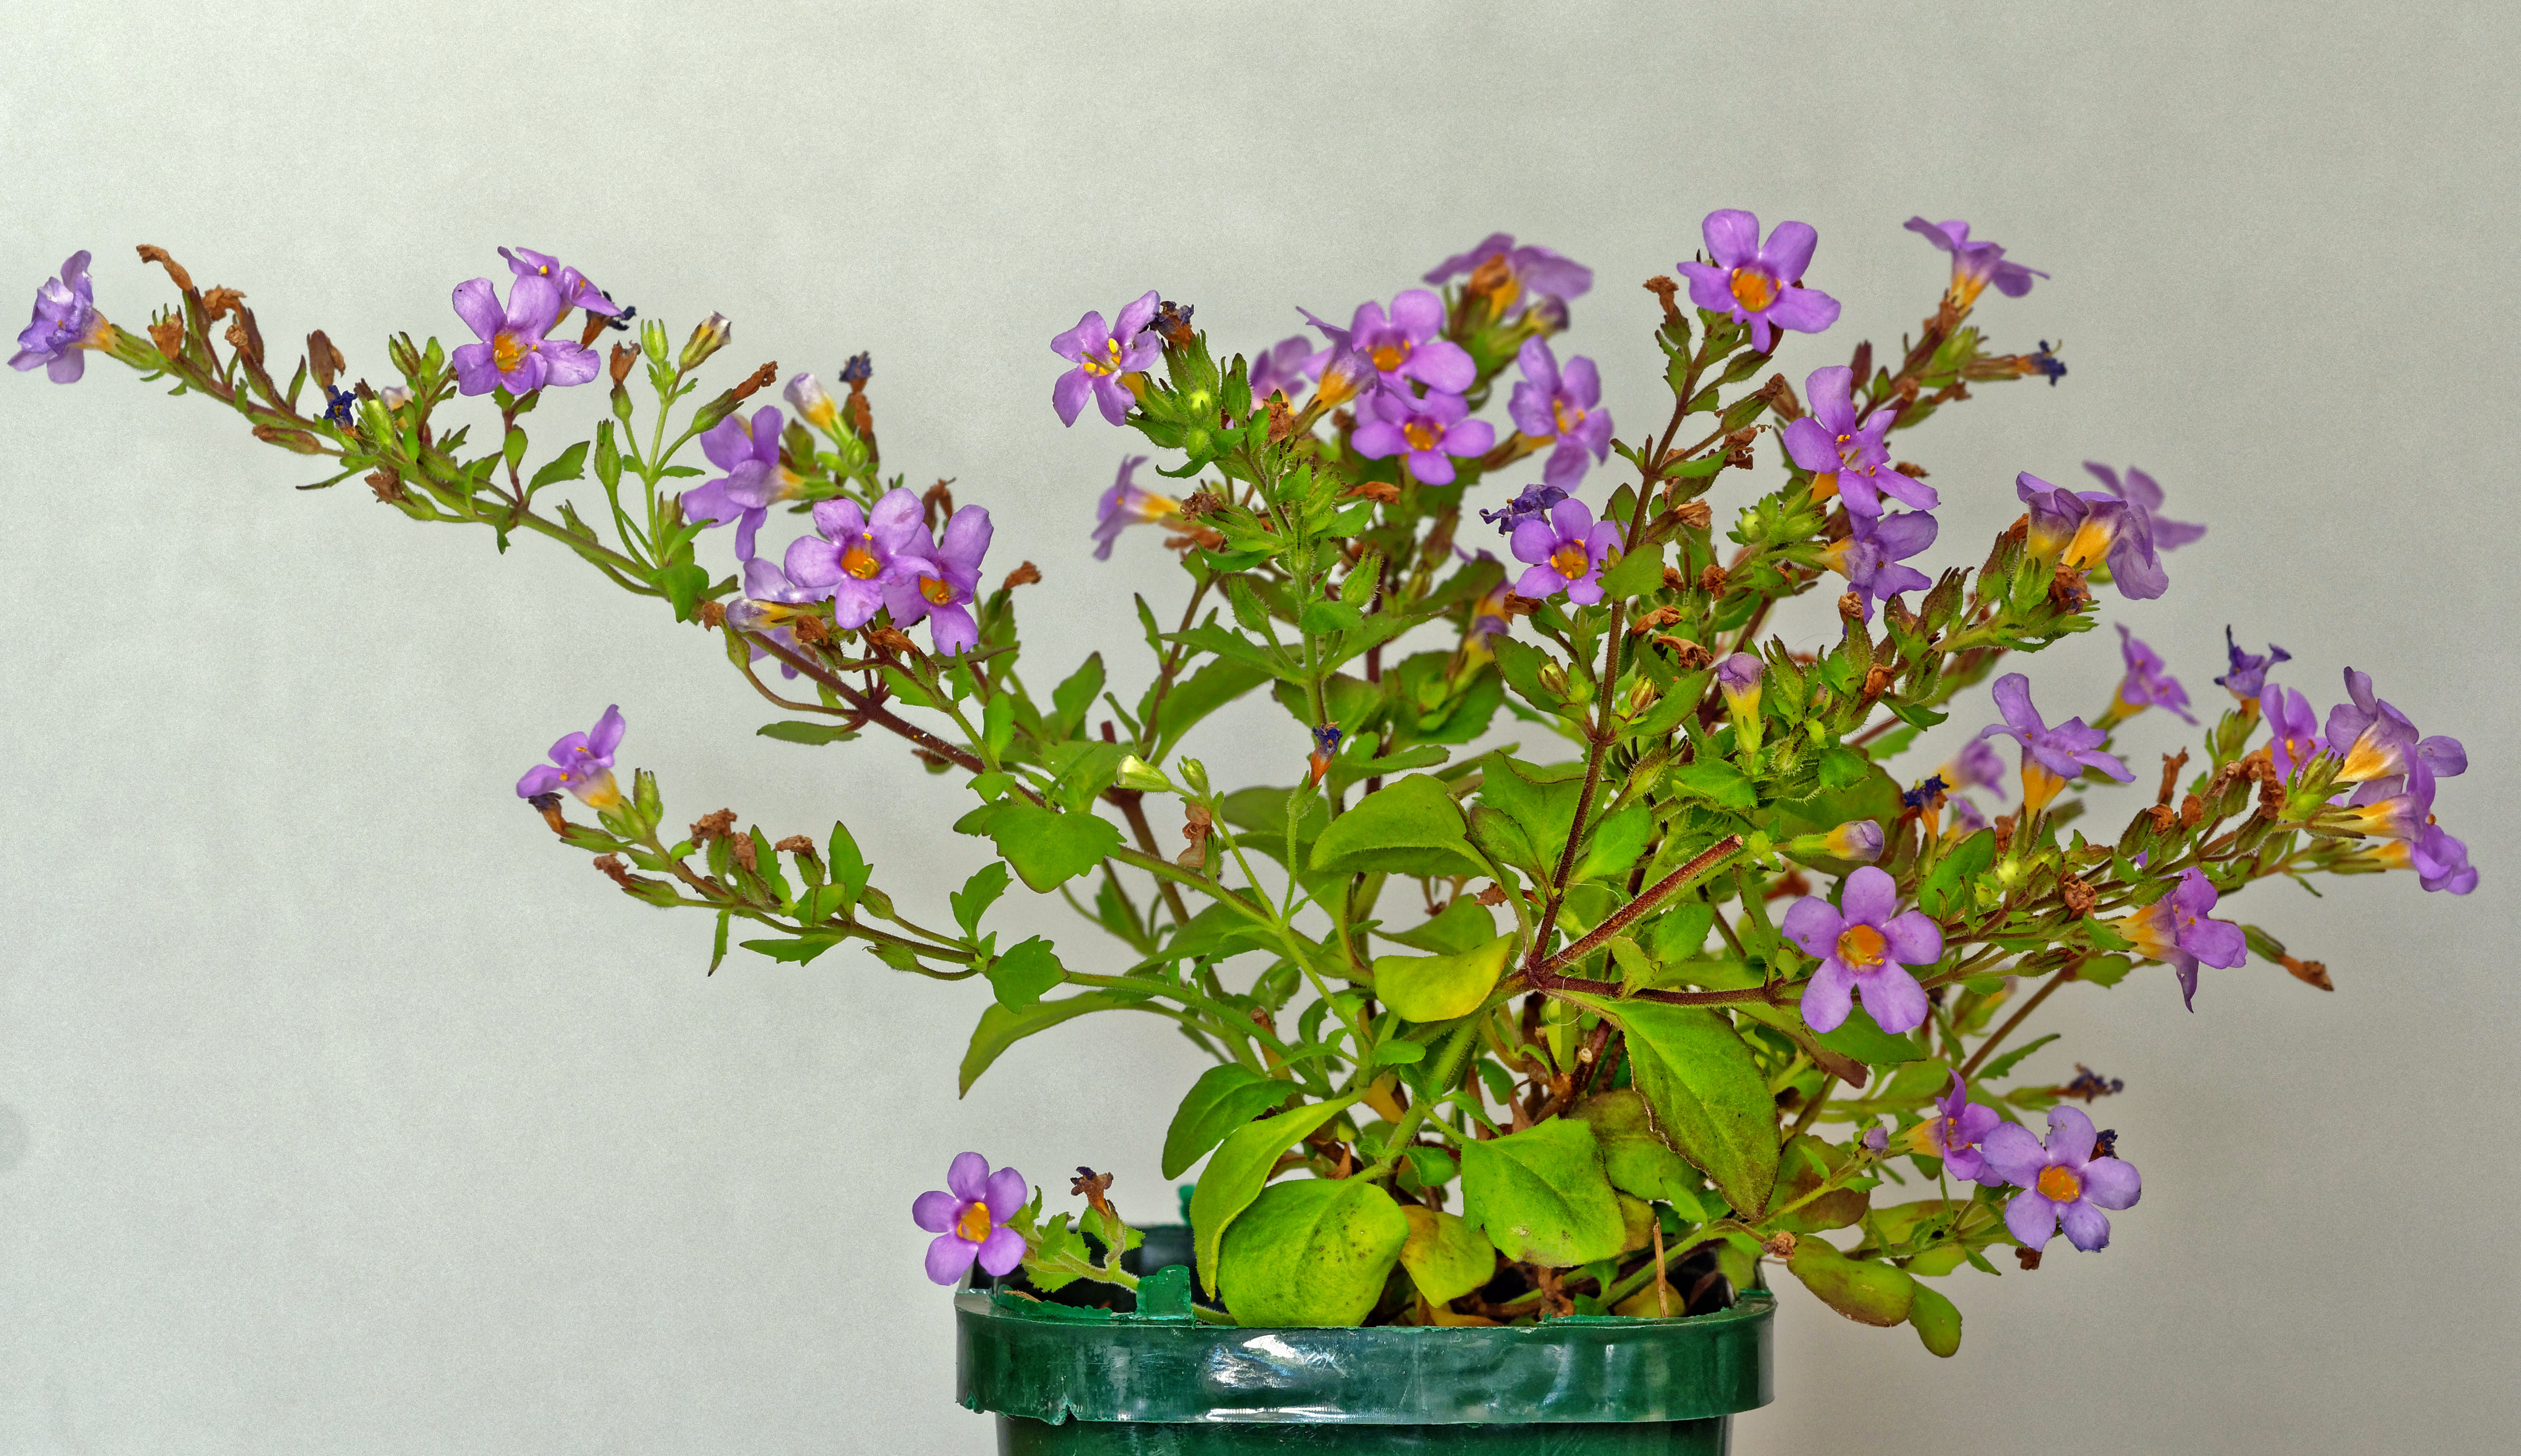 Chaenostoma-cordatum-3.jpeg